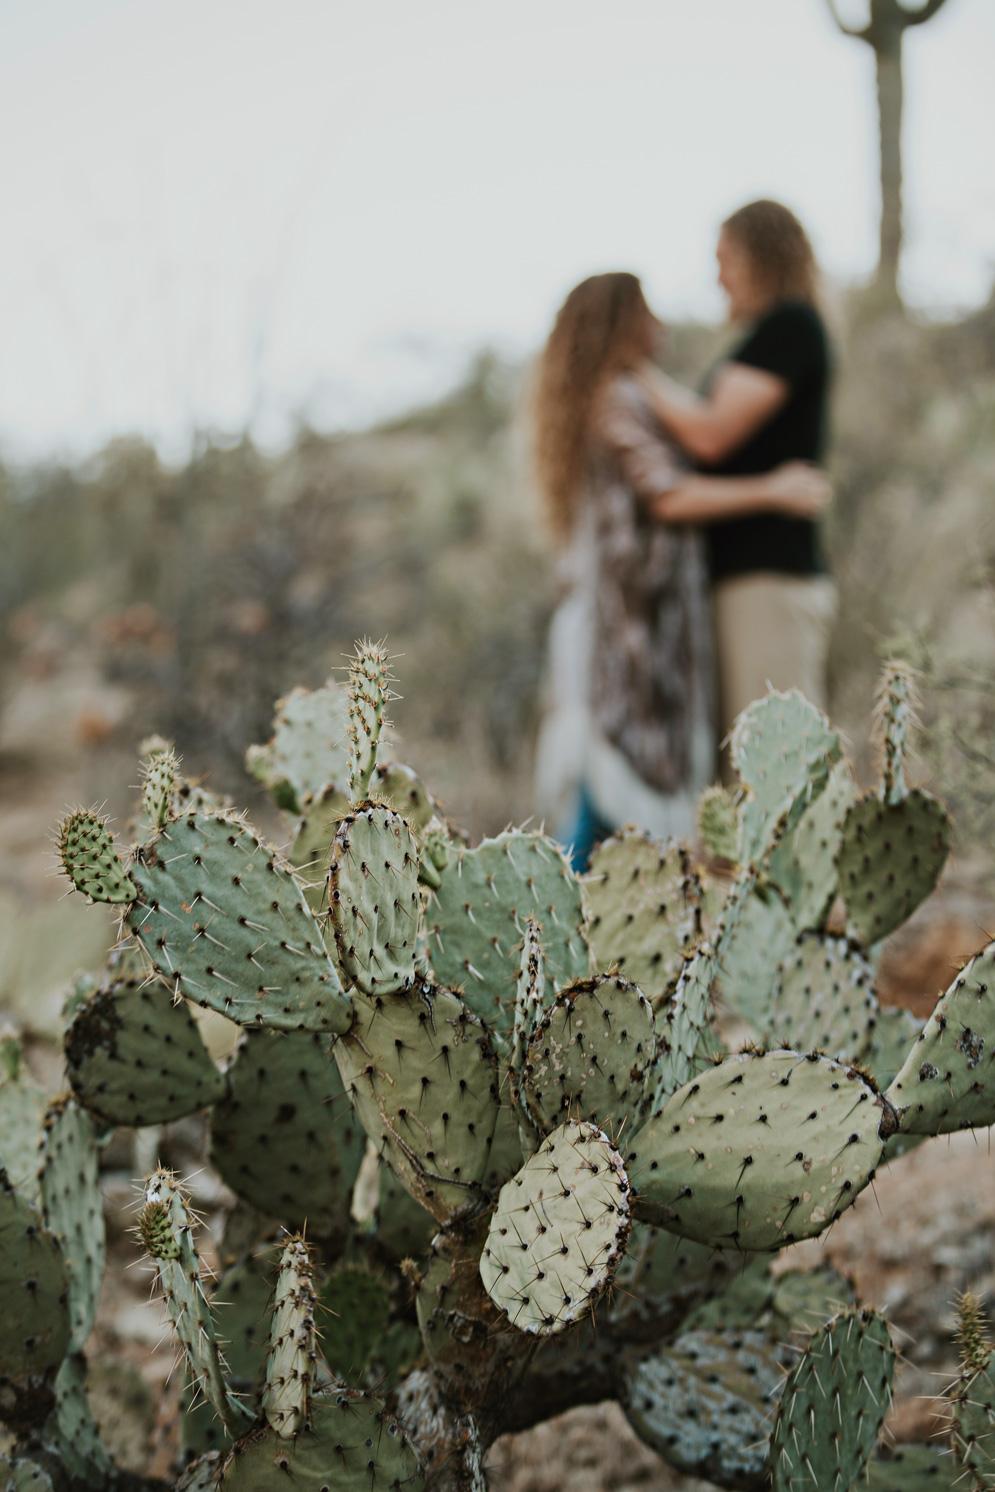 CindyGiovagnoli_Tucson_Arizona_engagement_lifestyle_portrait_Airstream_Excella_travel_trailer_camper_Saguaro_National_Park-025.jpg